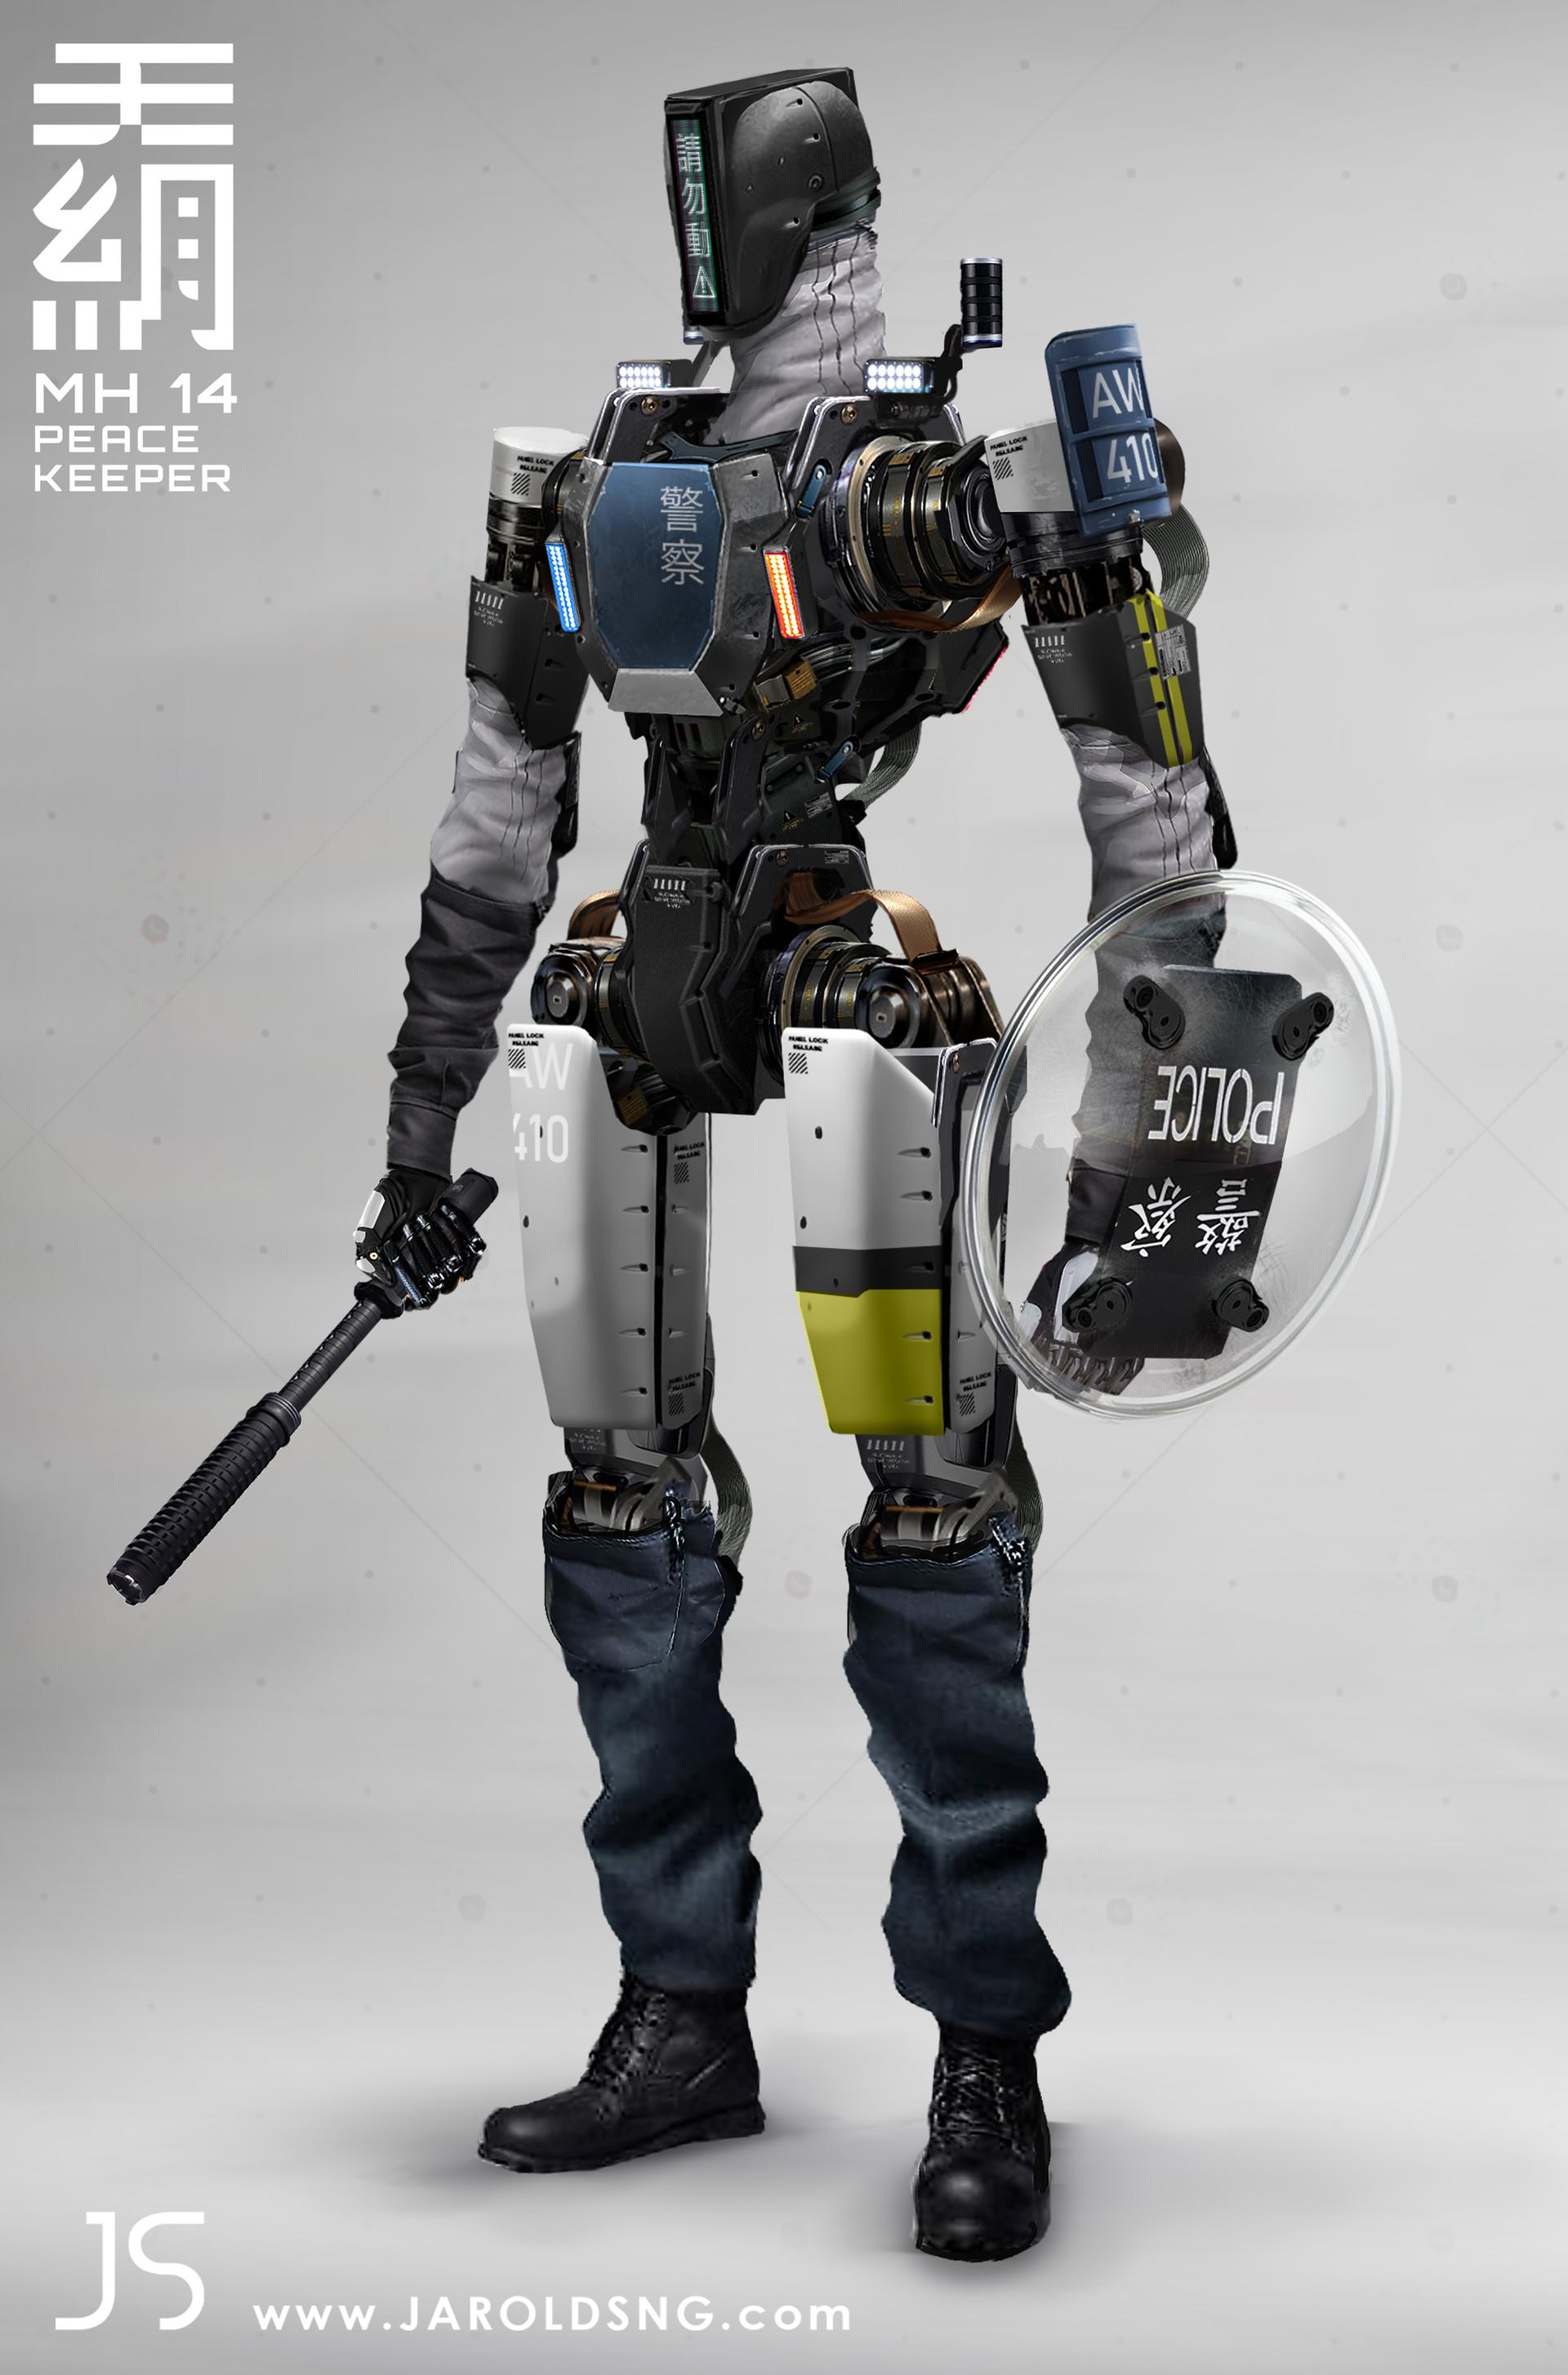 Jarold sng metalhex wa peacekeeper 02